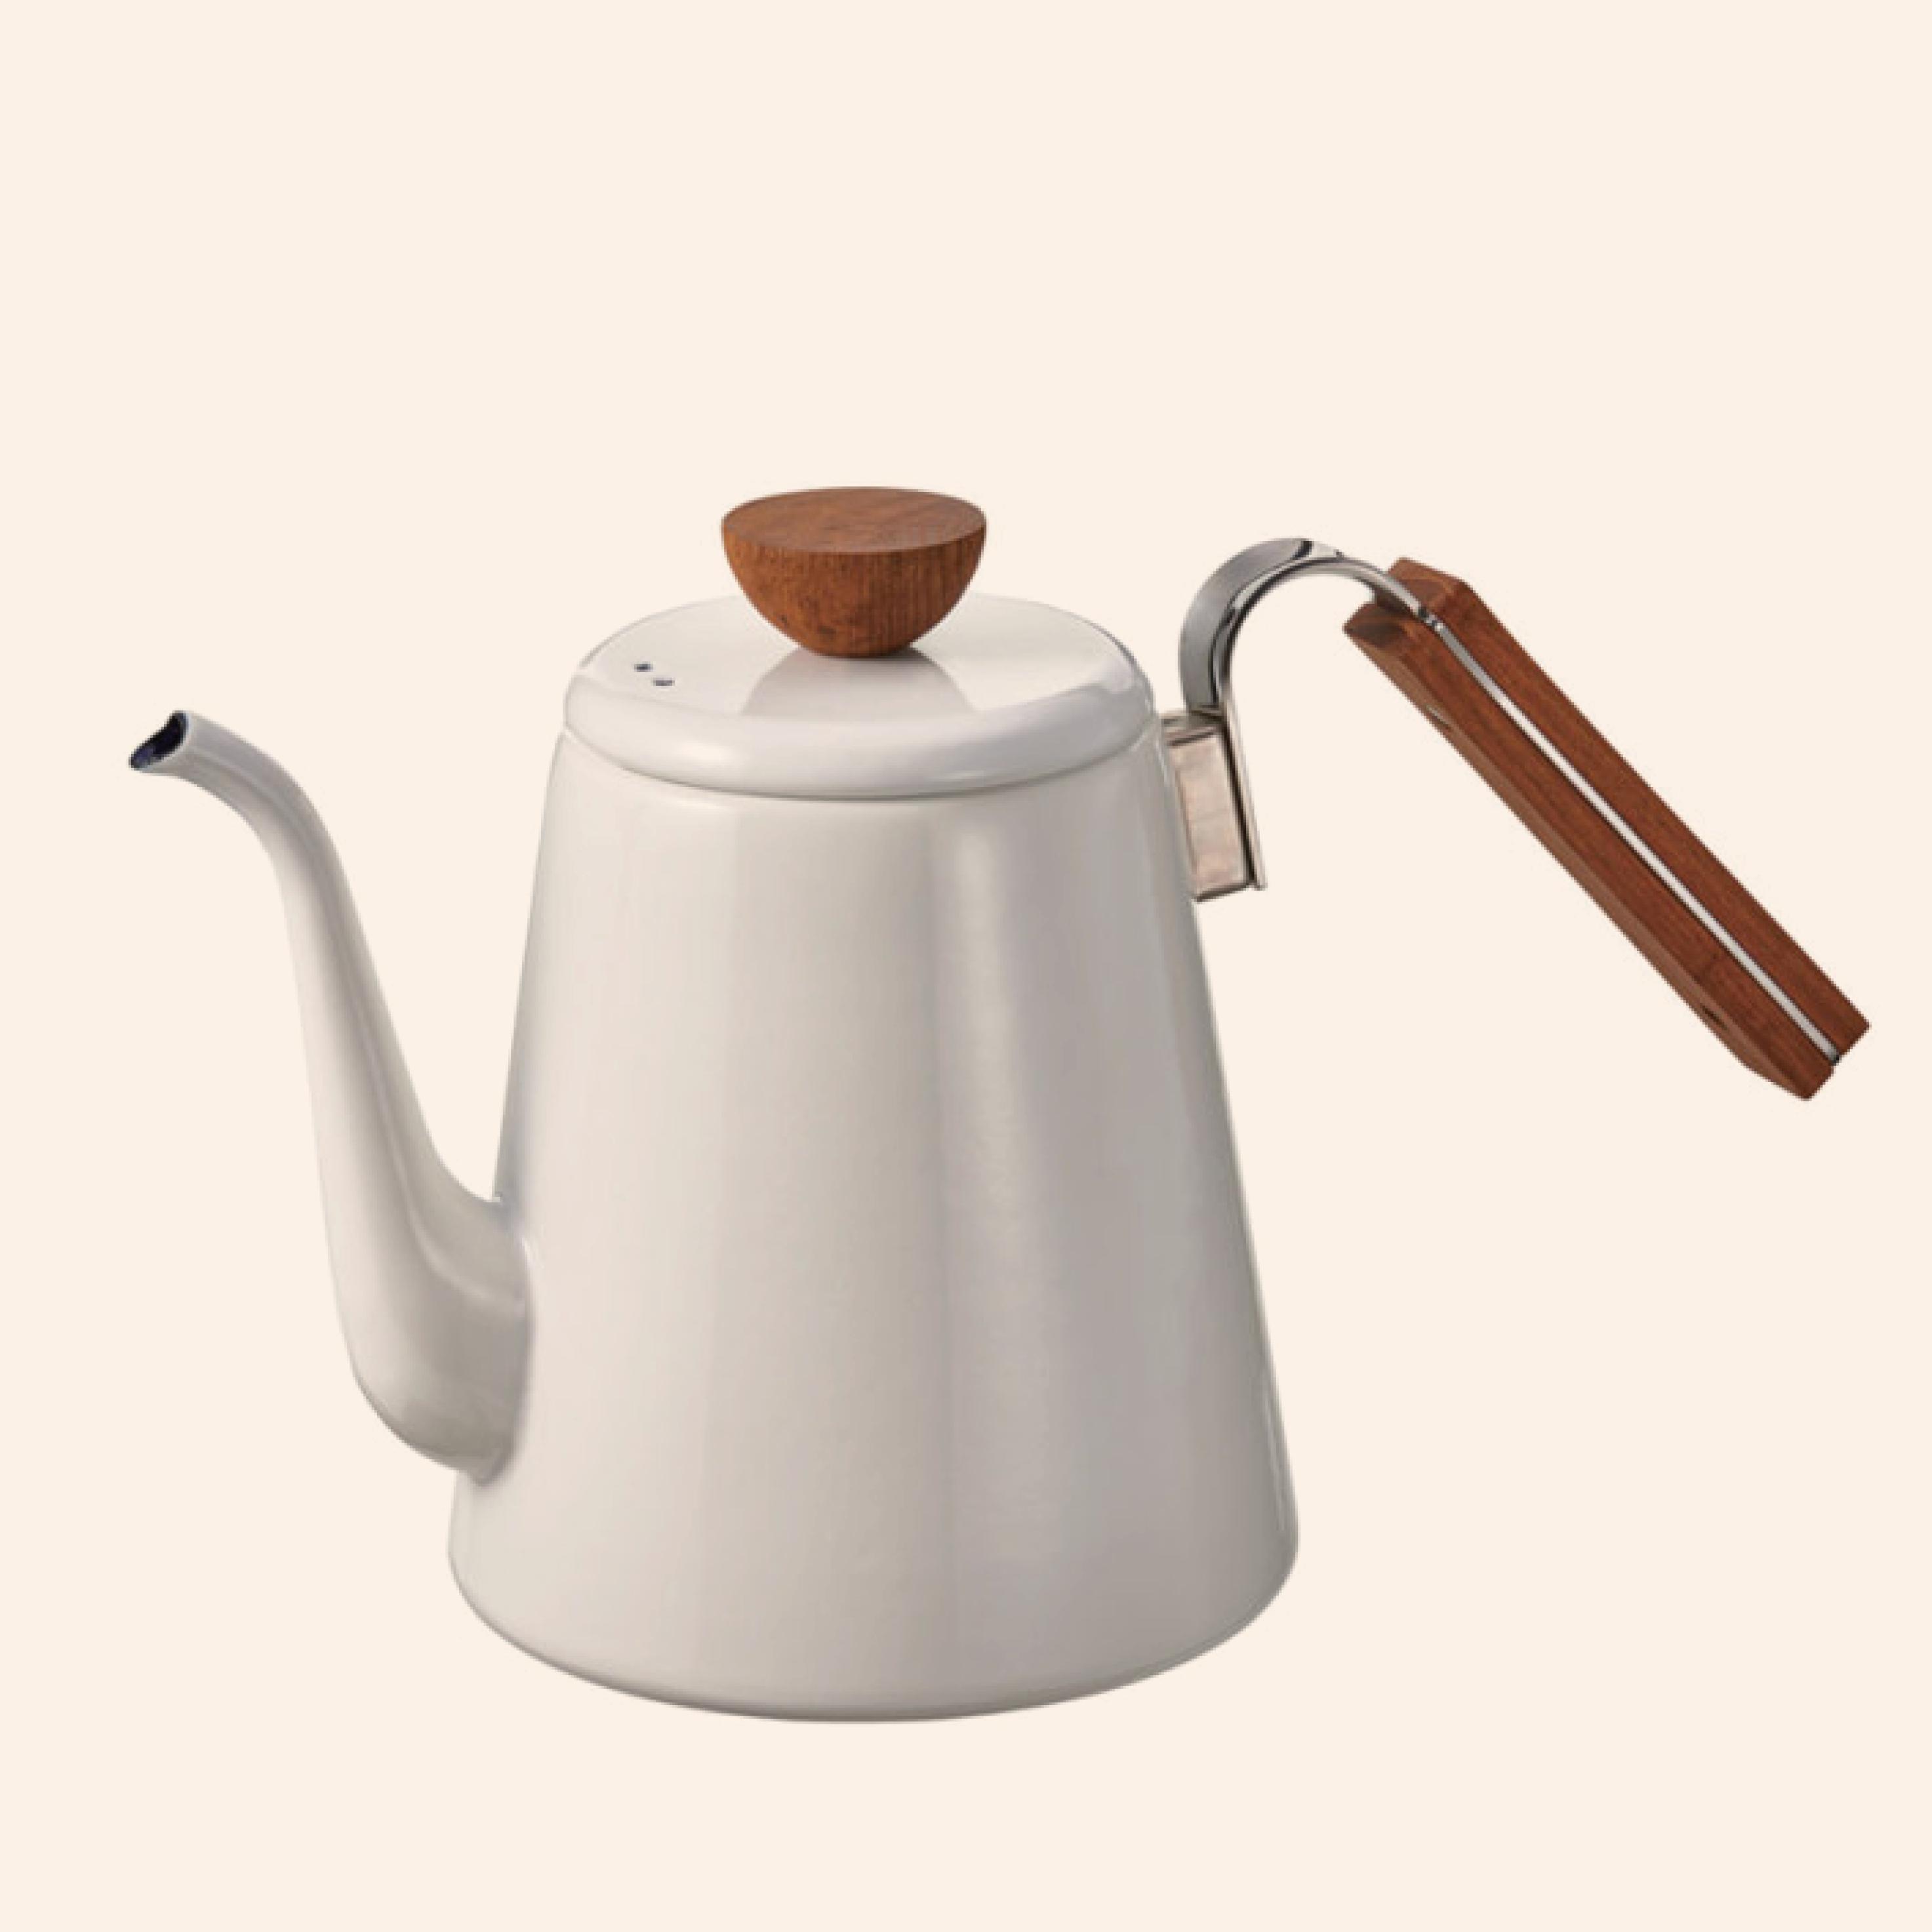 Hario Bona Coffee Kettle